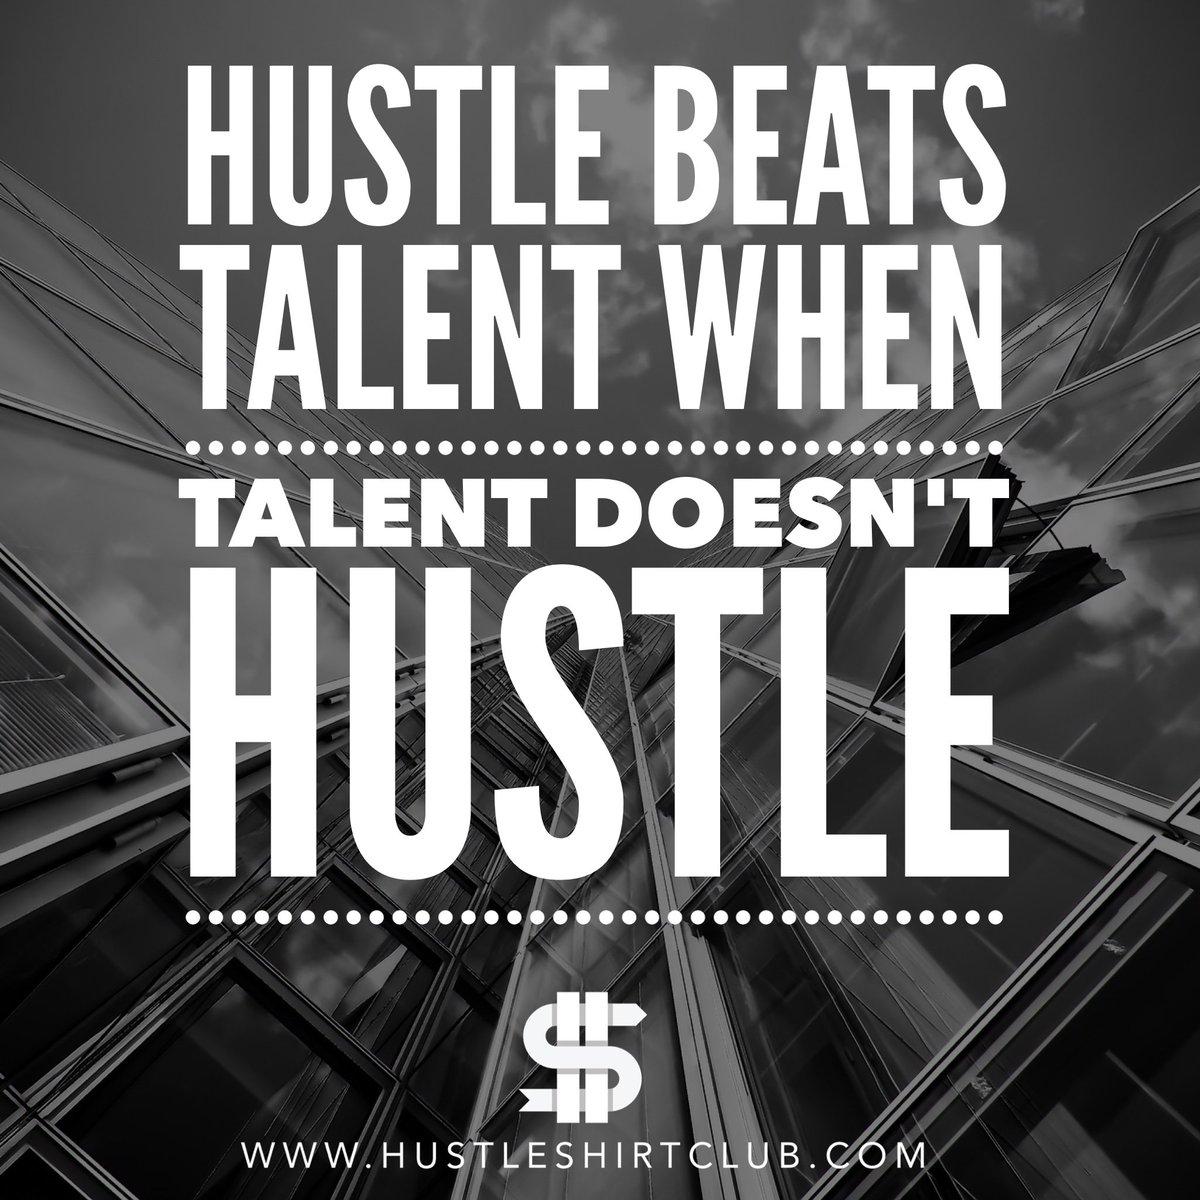 Hustle Shirt Club On Twitter Hustle Beats Talent When Talent